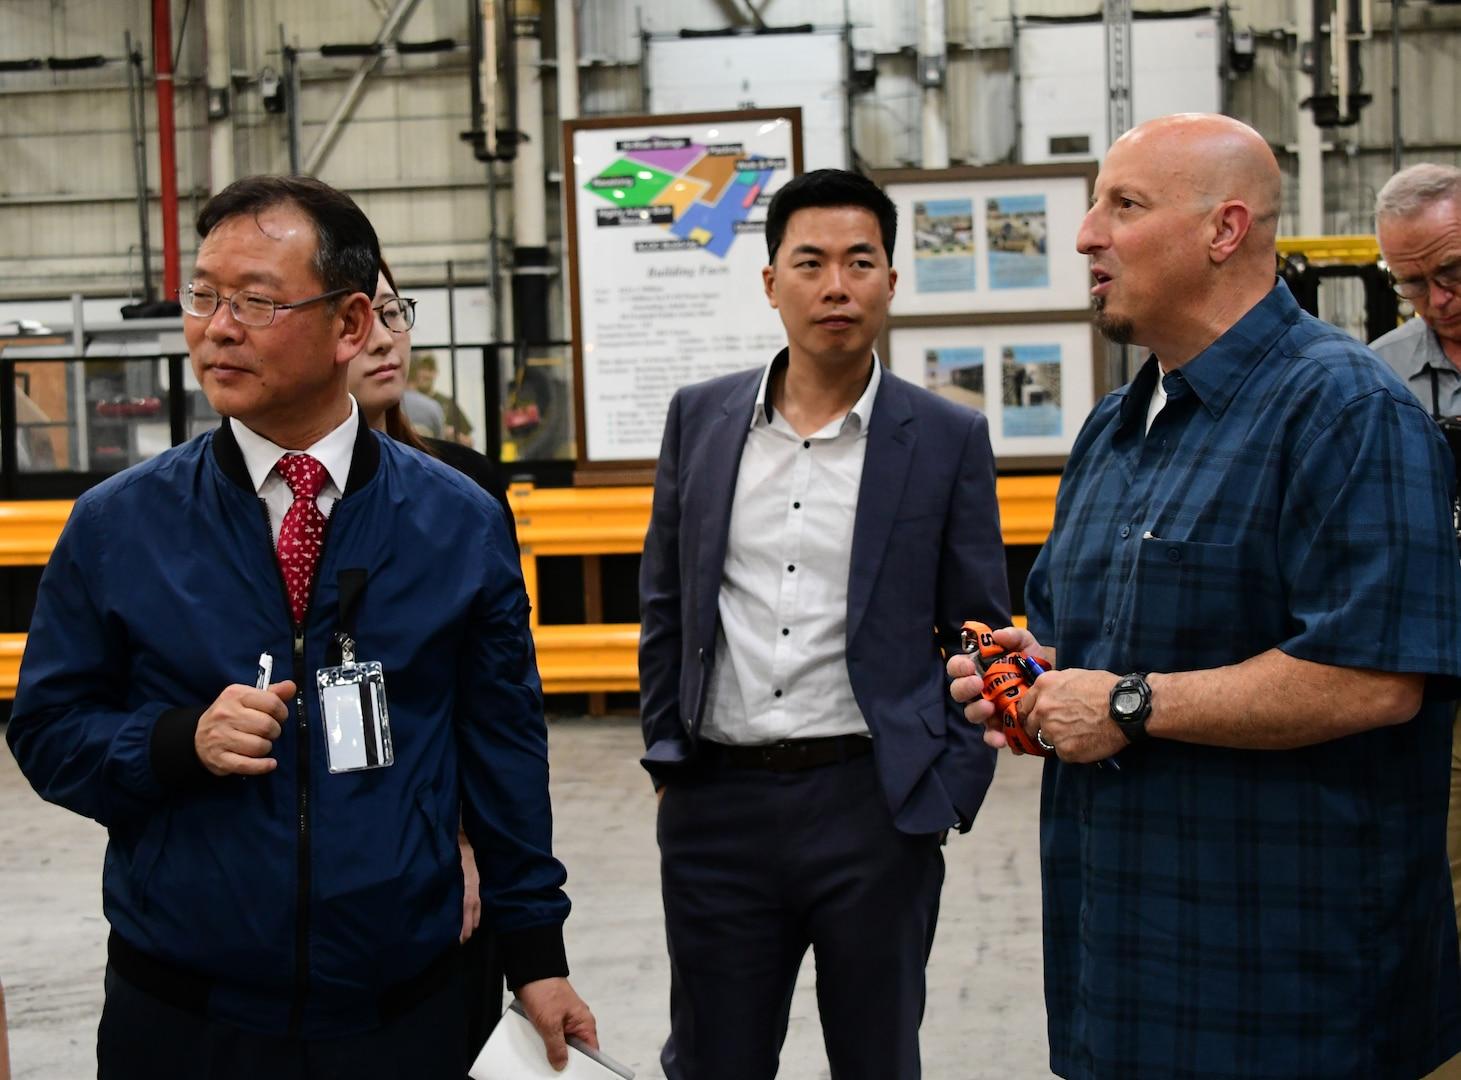 South Korea Ministry of Defense representatives visit DLA Distribution Susquehanna, Pennsylvania